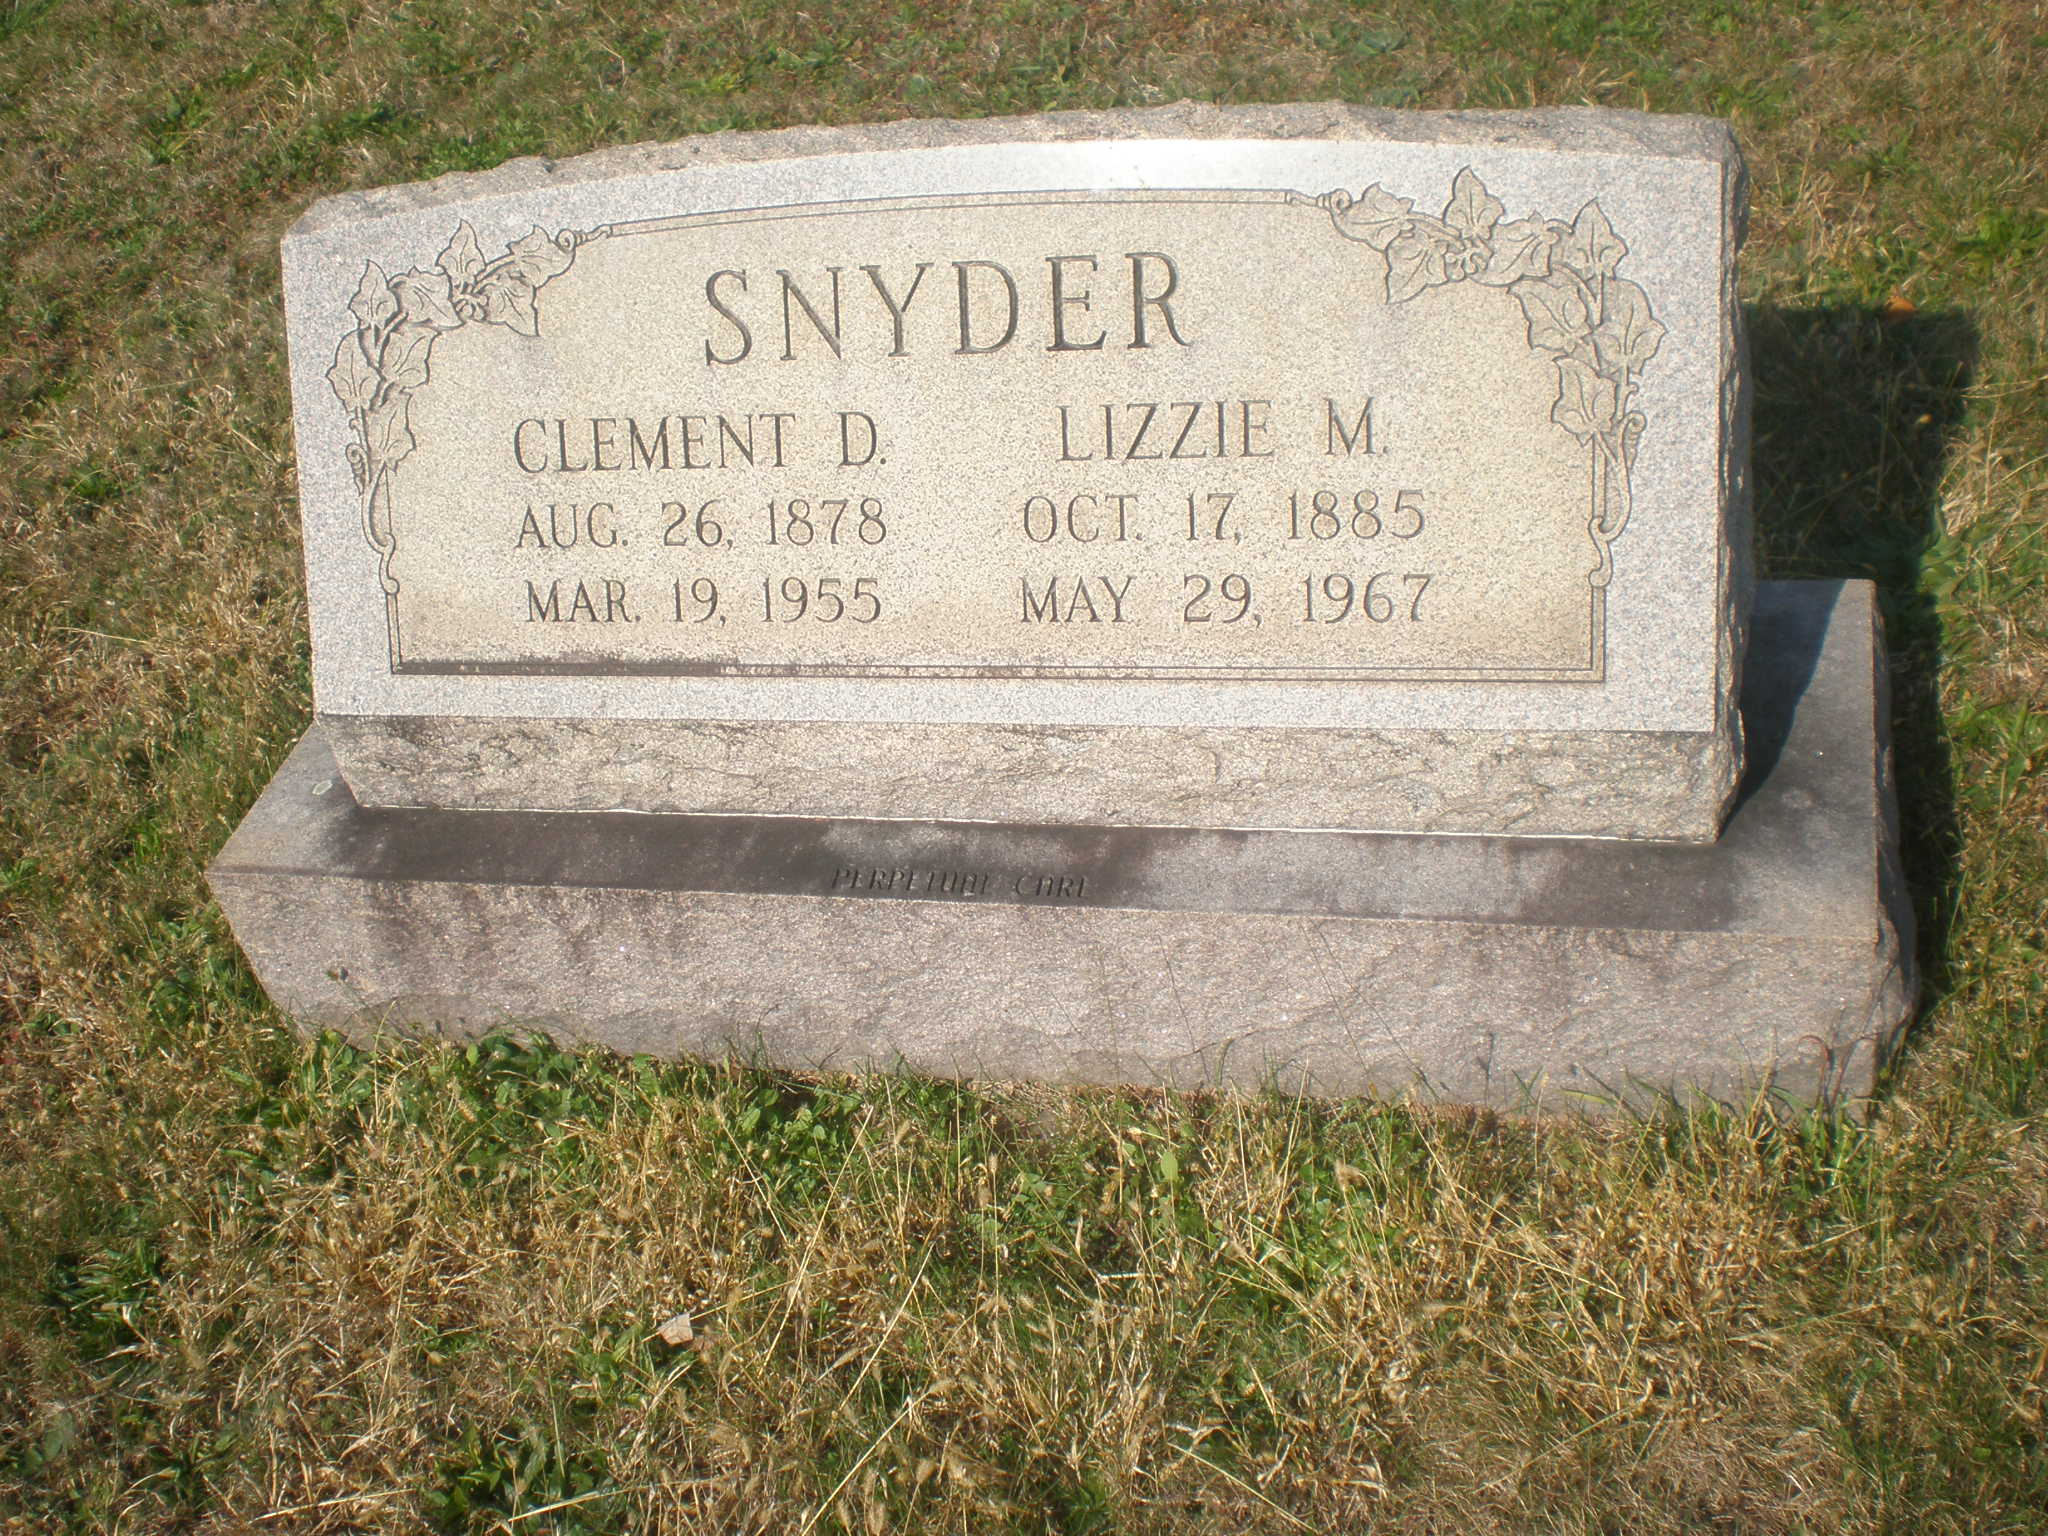 Clement Daniel Snyder